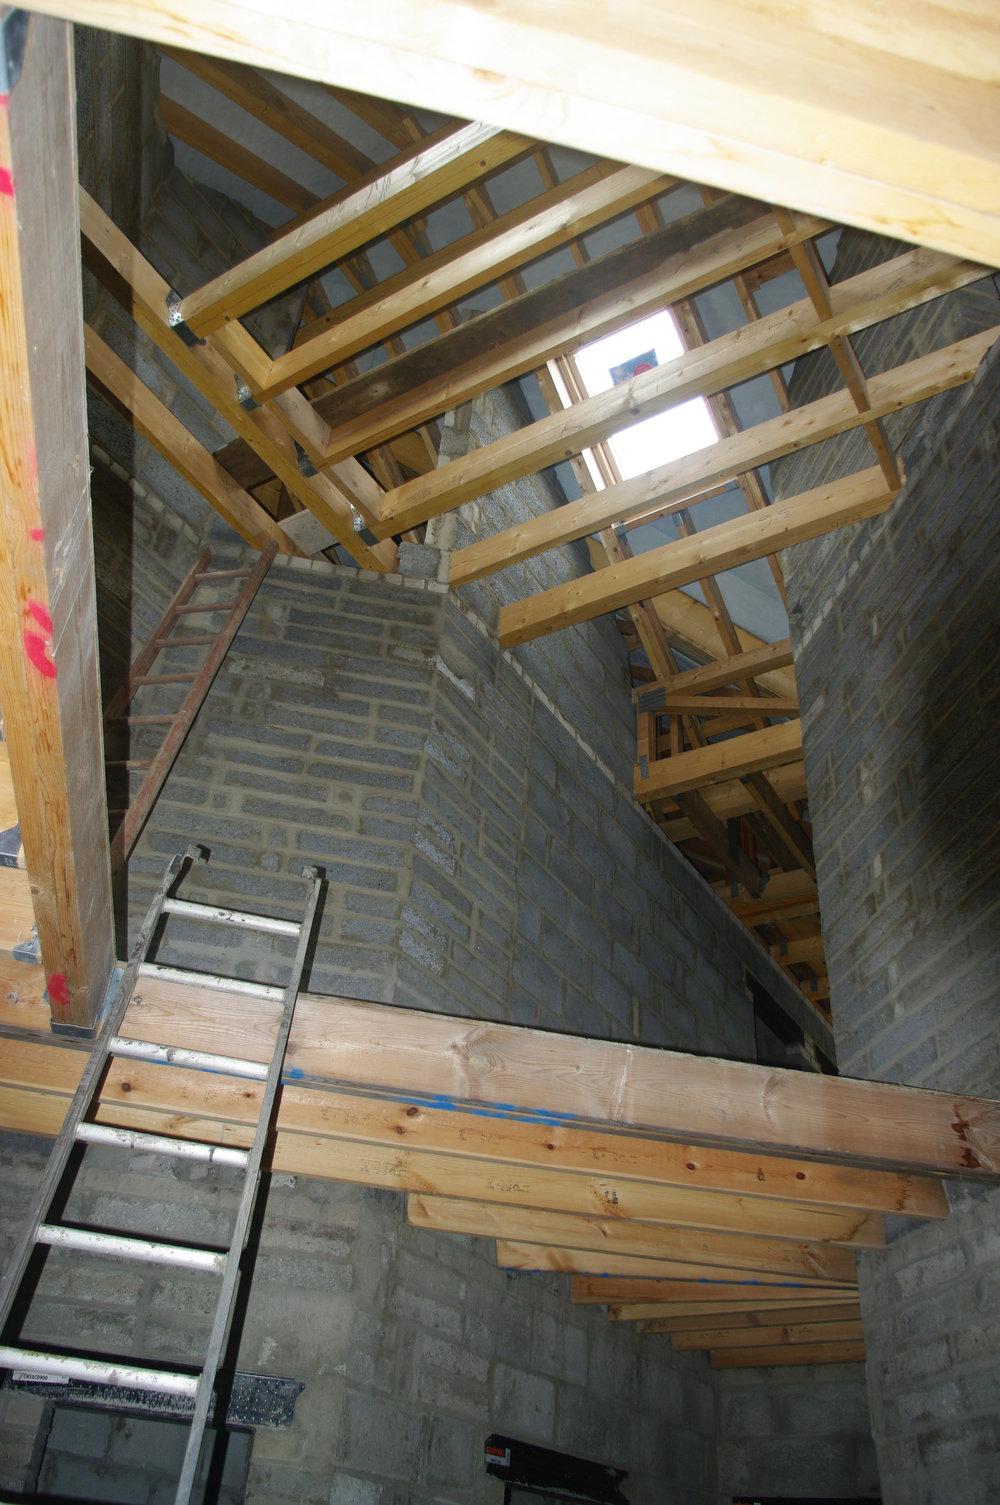 Rascal Wood Construction 20 - East Yorkshire Architects - Samuel Kendall Associates.JPG